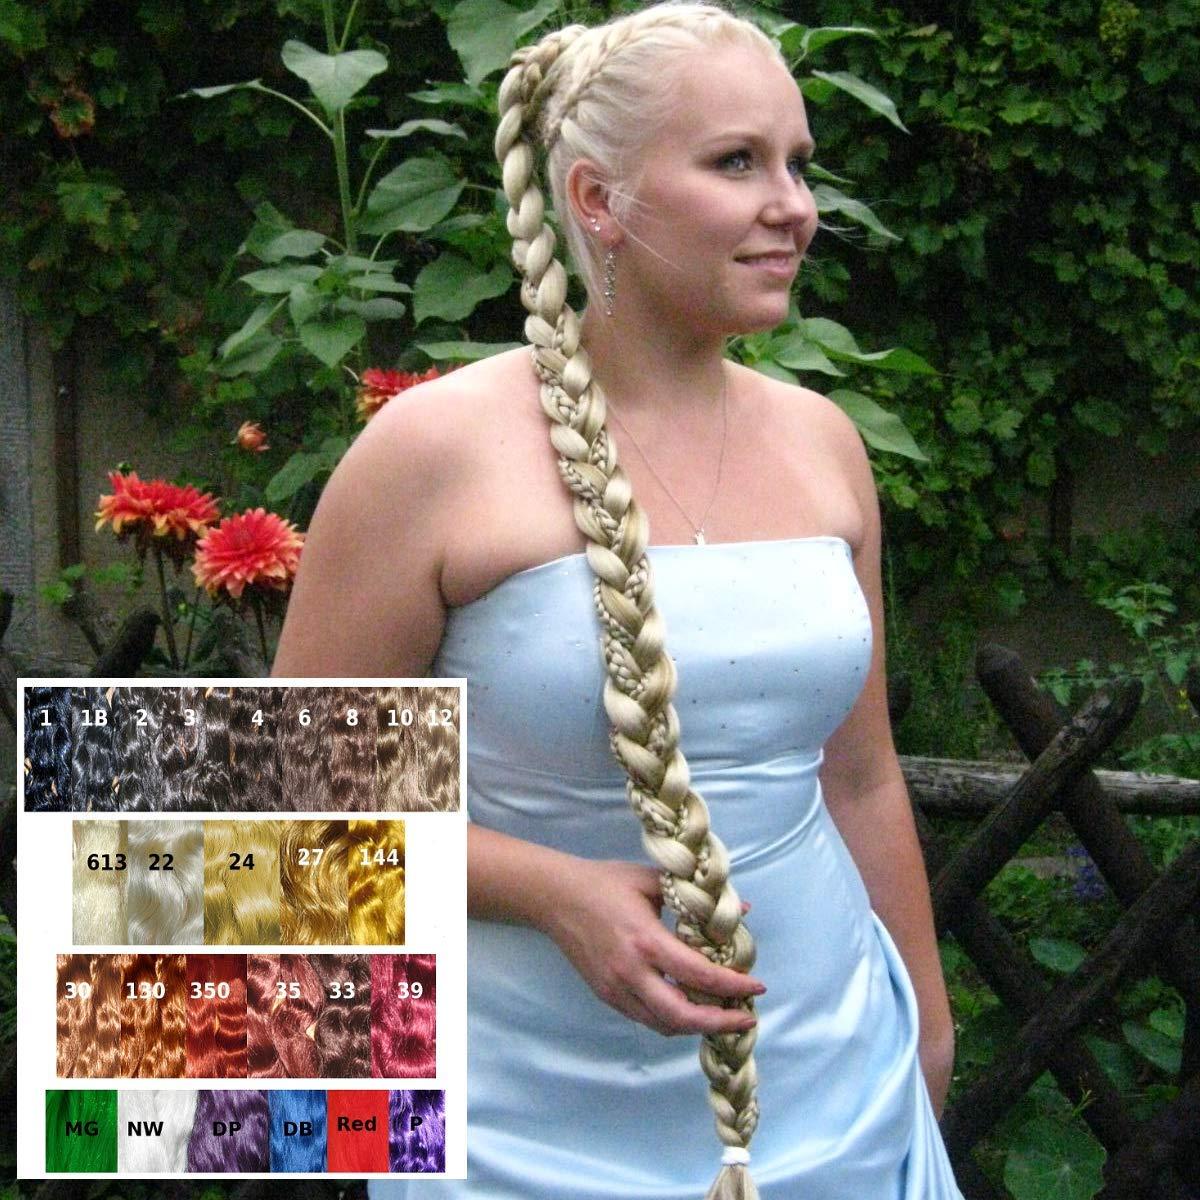 Amazon Com Rapunzel Bride Braid Hair Extension Handmade In Your Hair Color 36 Braided Bridal Prom Hair Piece Renaissance Formal Wedding Ponytail Plait More Styling Options Braided Hair Bun Halo Braid